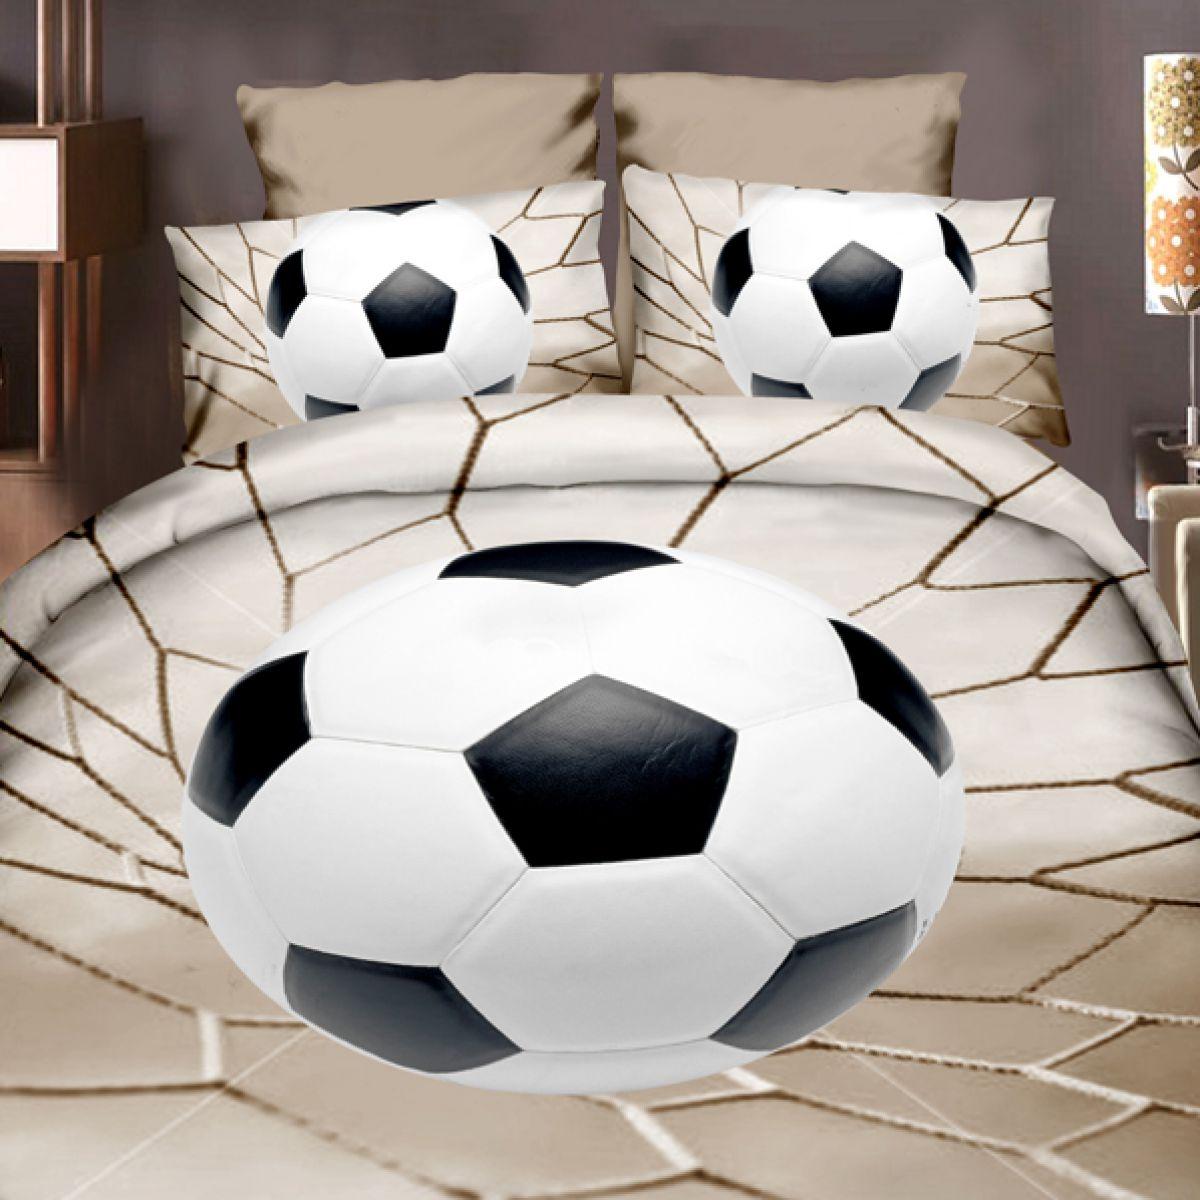 3D Beddings - Antonio - AML-44 - 160x200 cm - 4 pcs